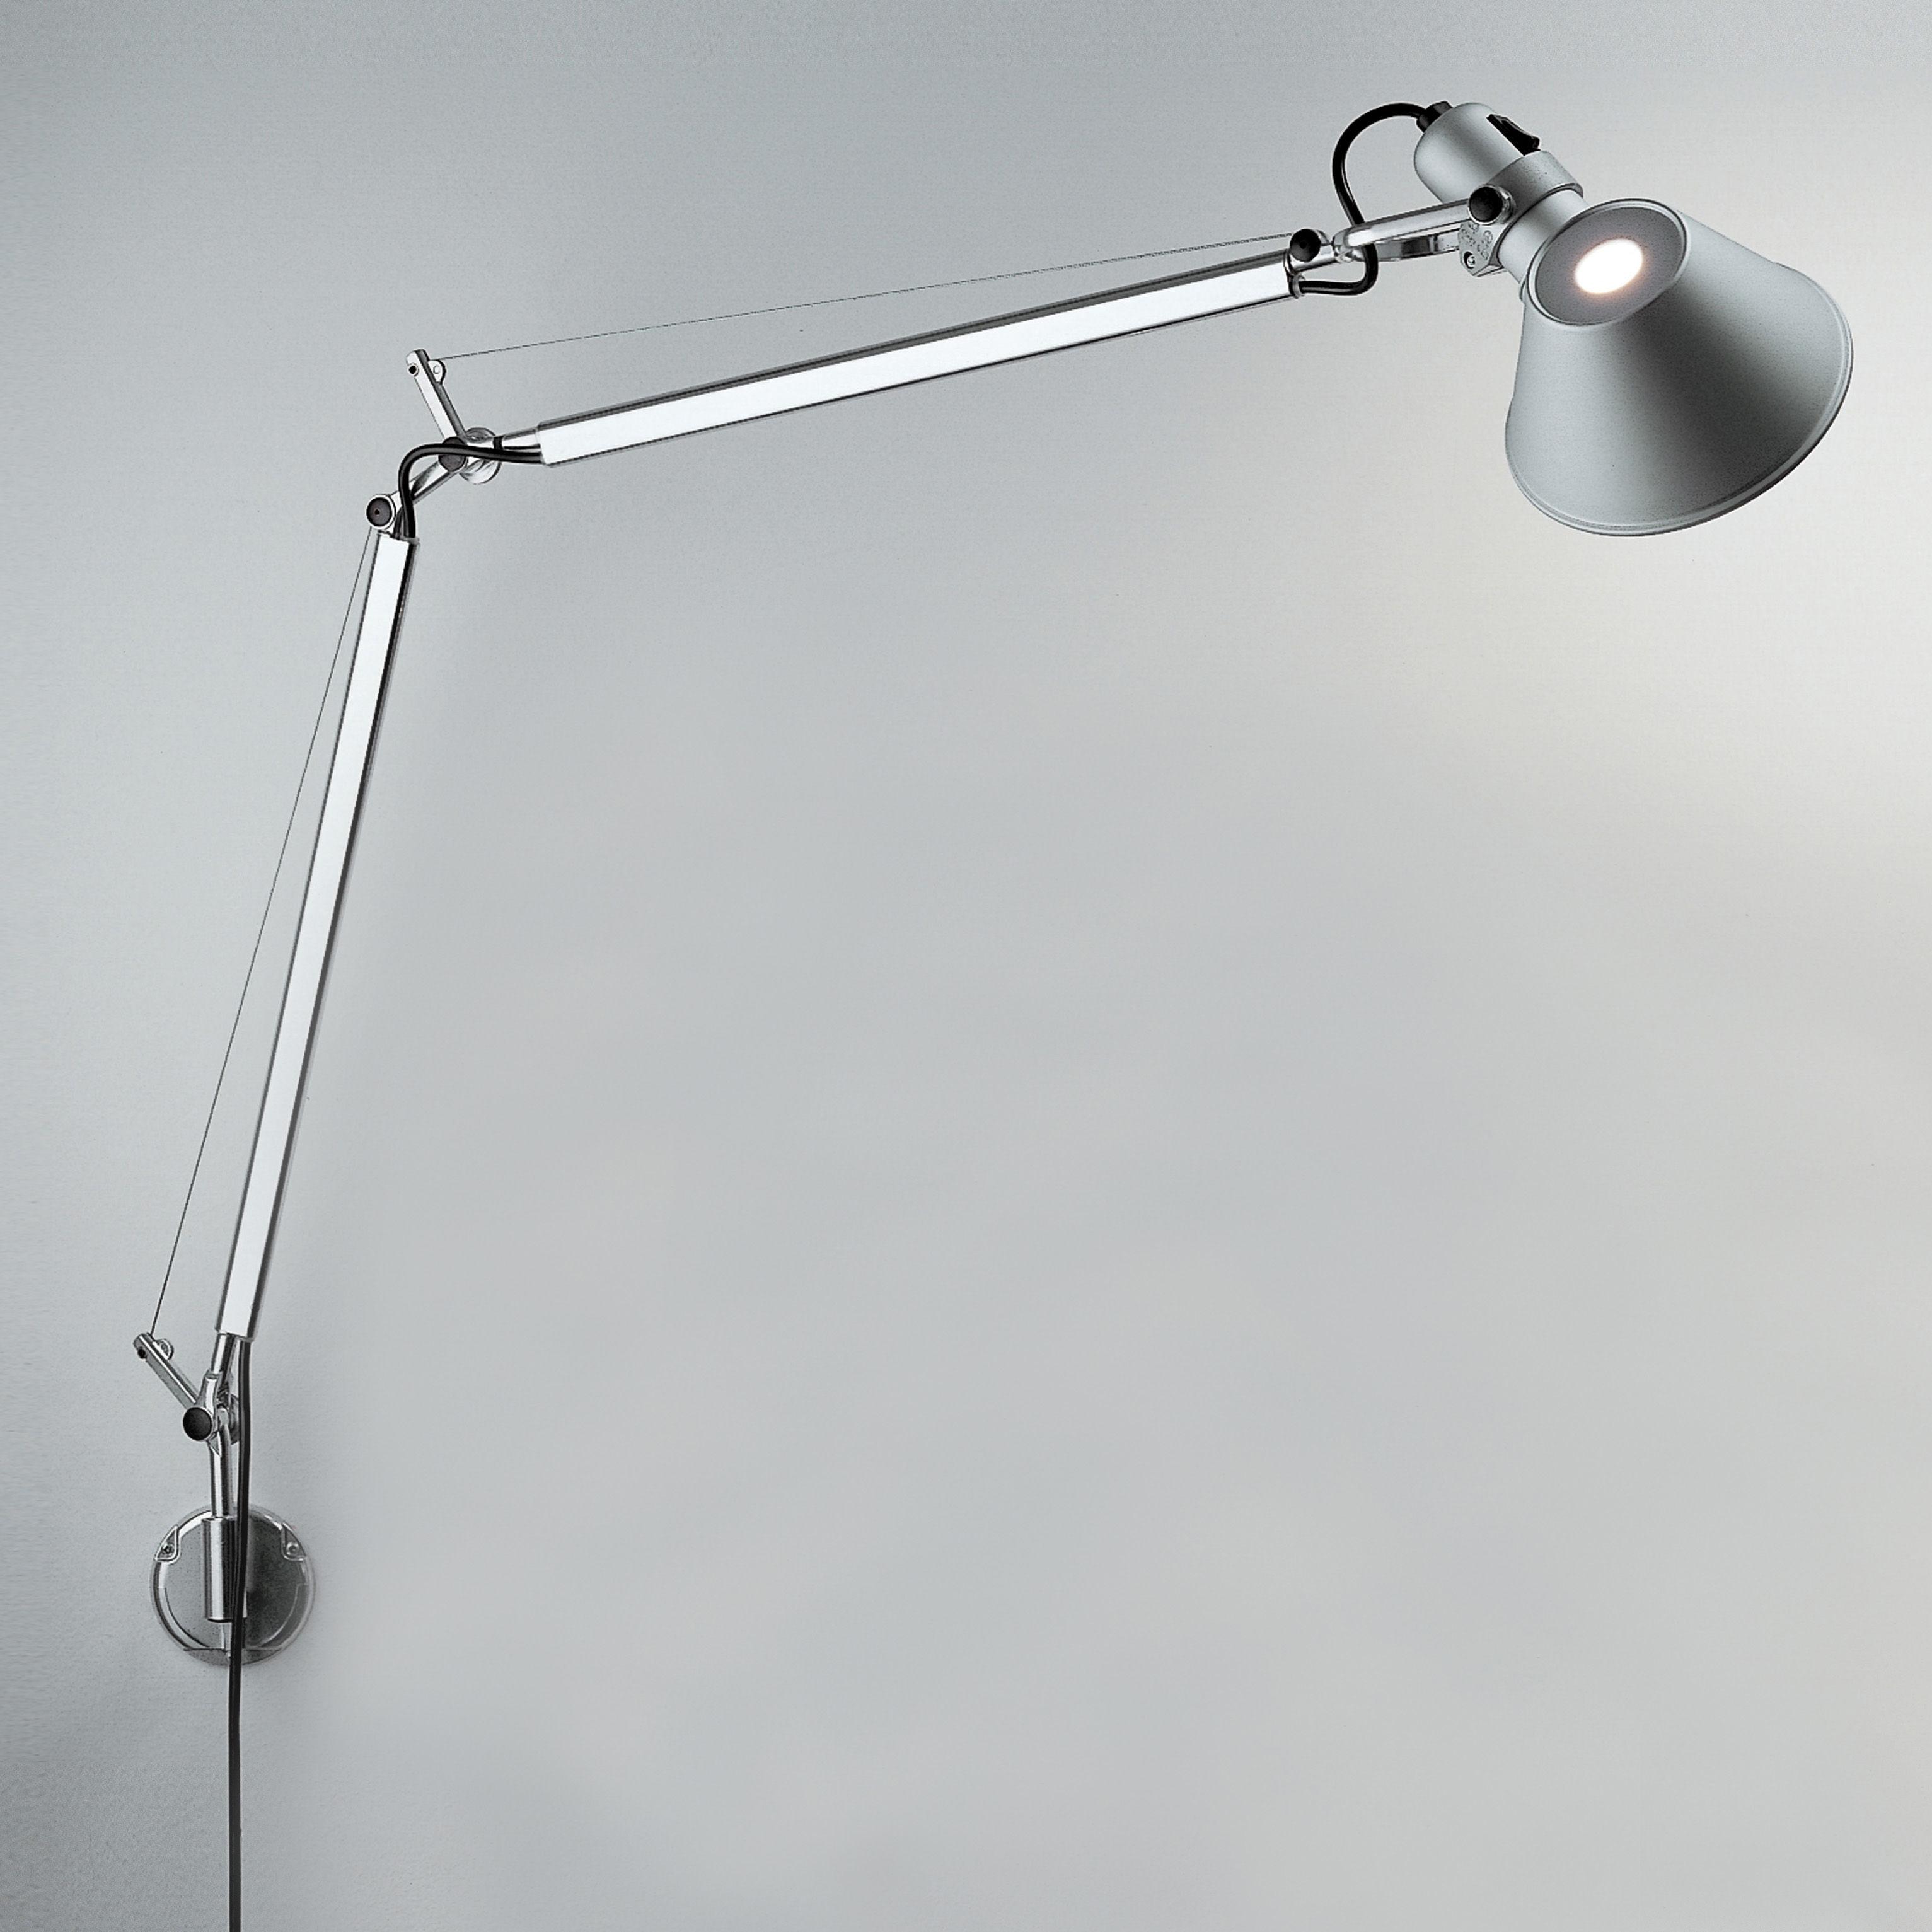 Lighting - Wall Lights - Tolomeo Wall LED Wall light - LED - With arm by Artemide - LED - Aluminium - Aluminium